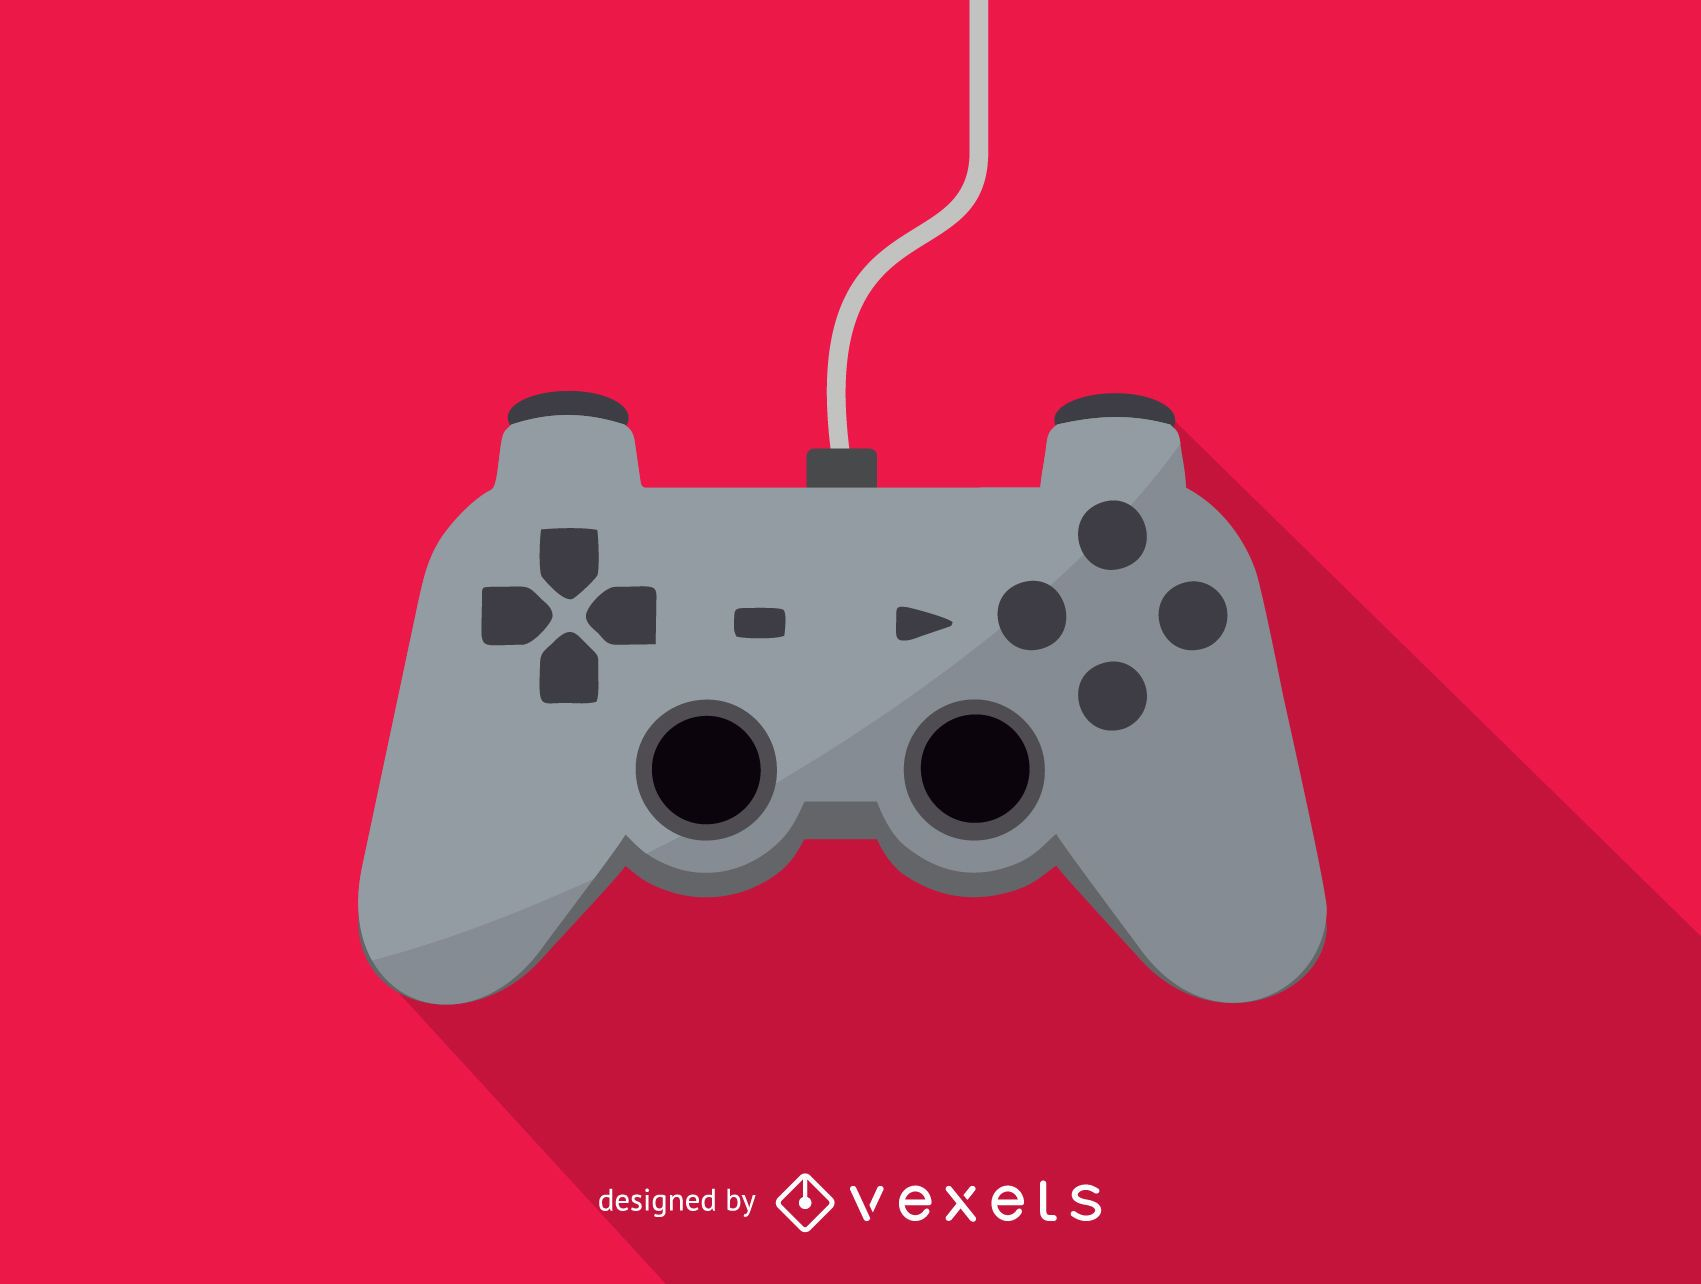 Gaming console joystick icon - Vector download